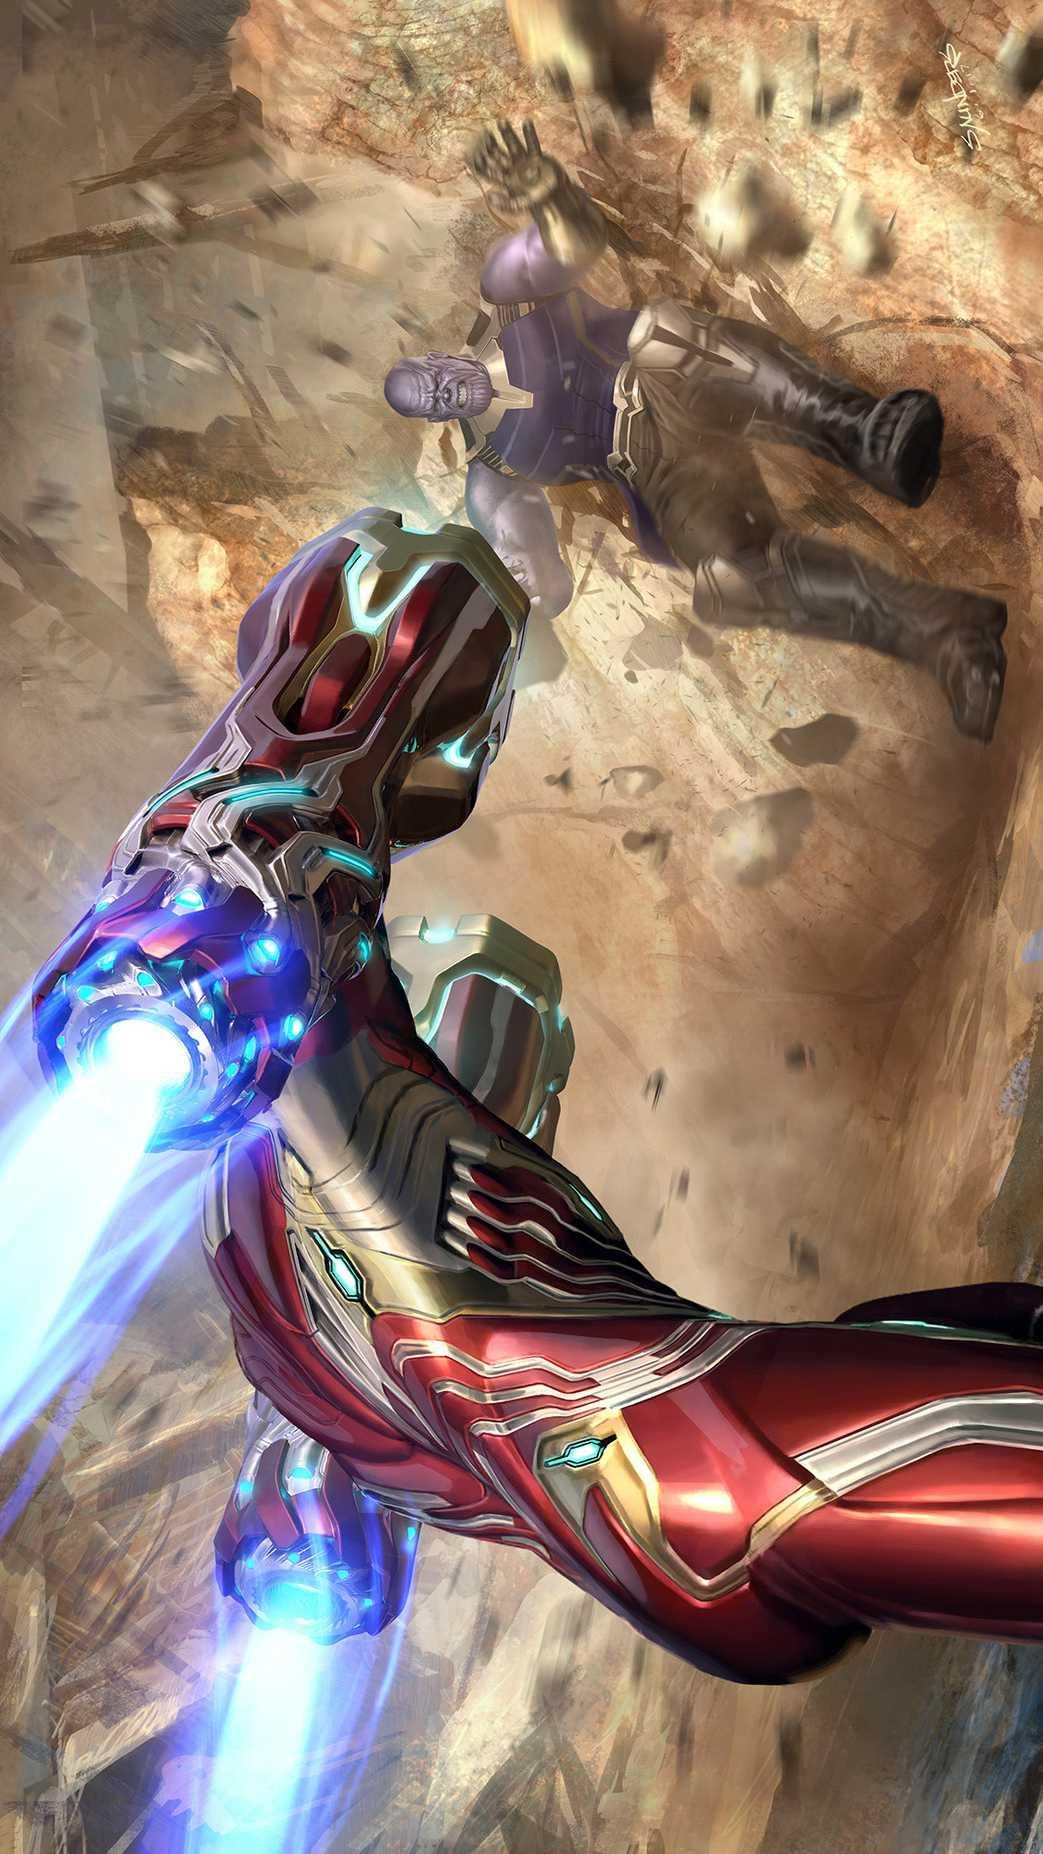 Anime Quotes Desktop Wallpaper Avengers Endgame Iron Man Vs Thanos Fight Iphone Wallpaper